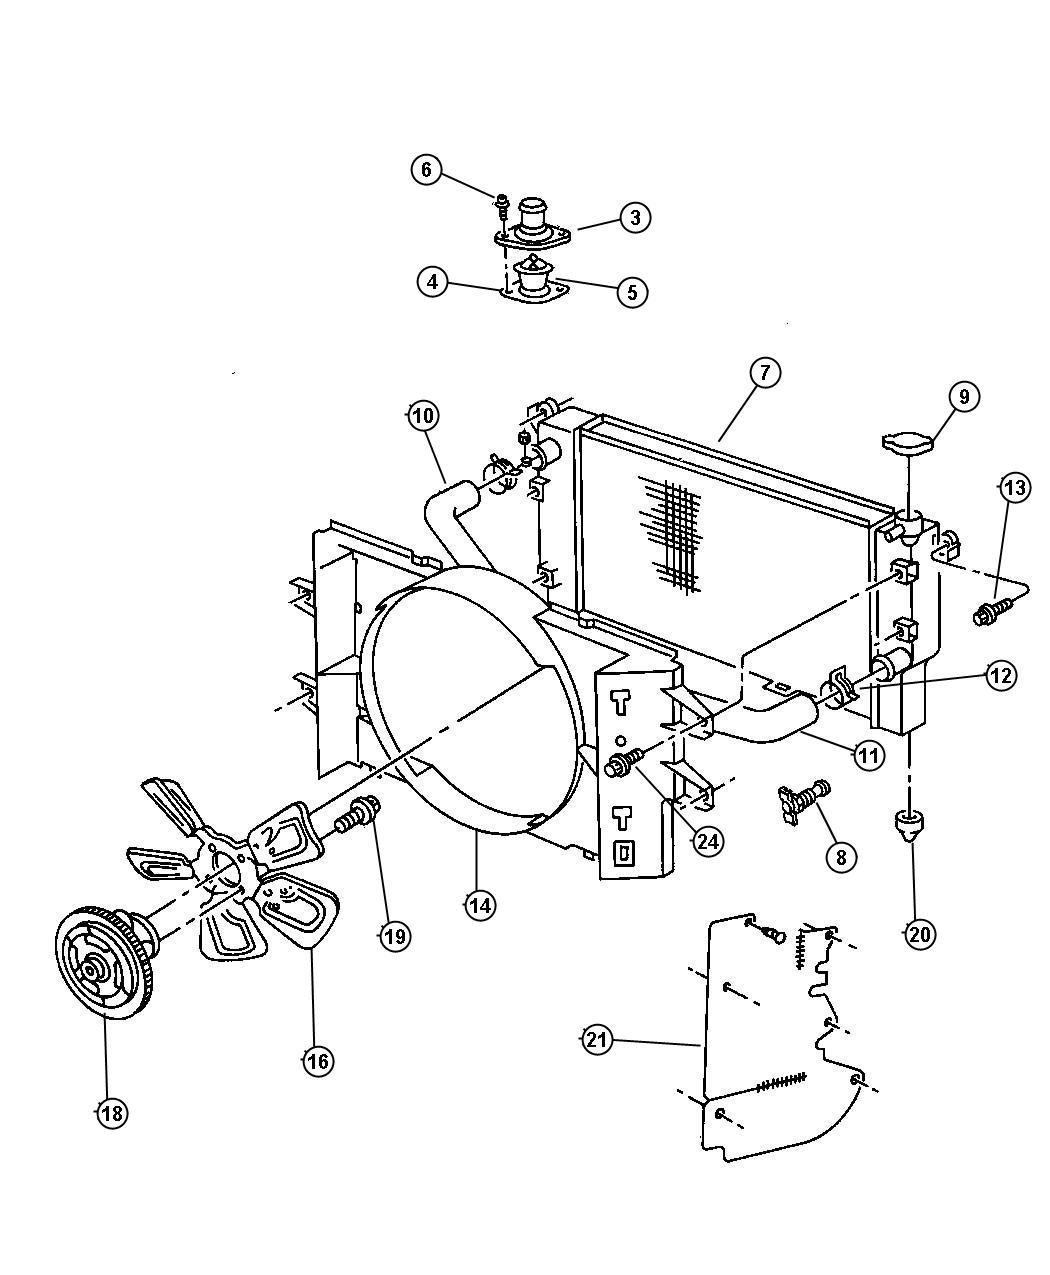 1991 Dodge Dakota Housing. Thermostat. Max, wmax, dps